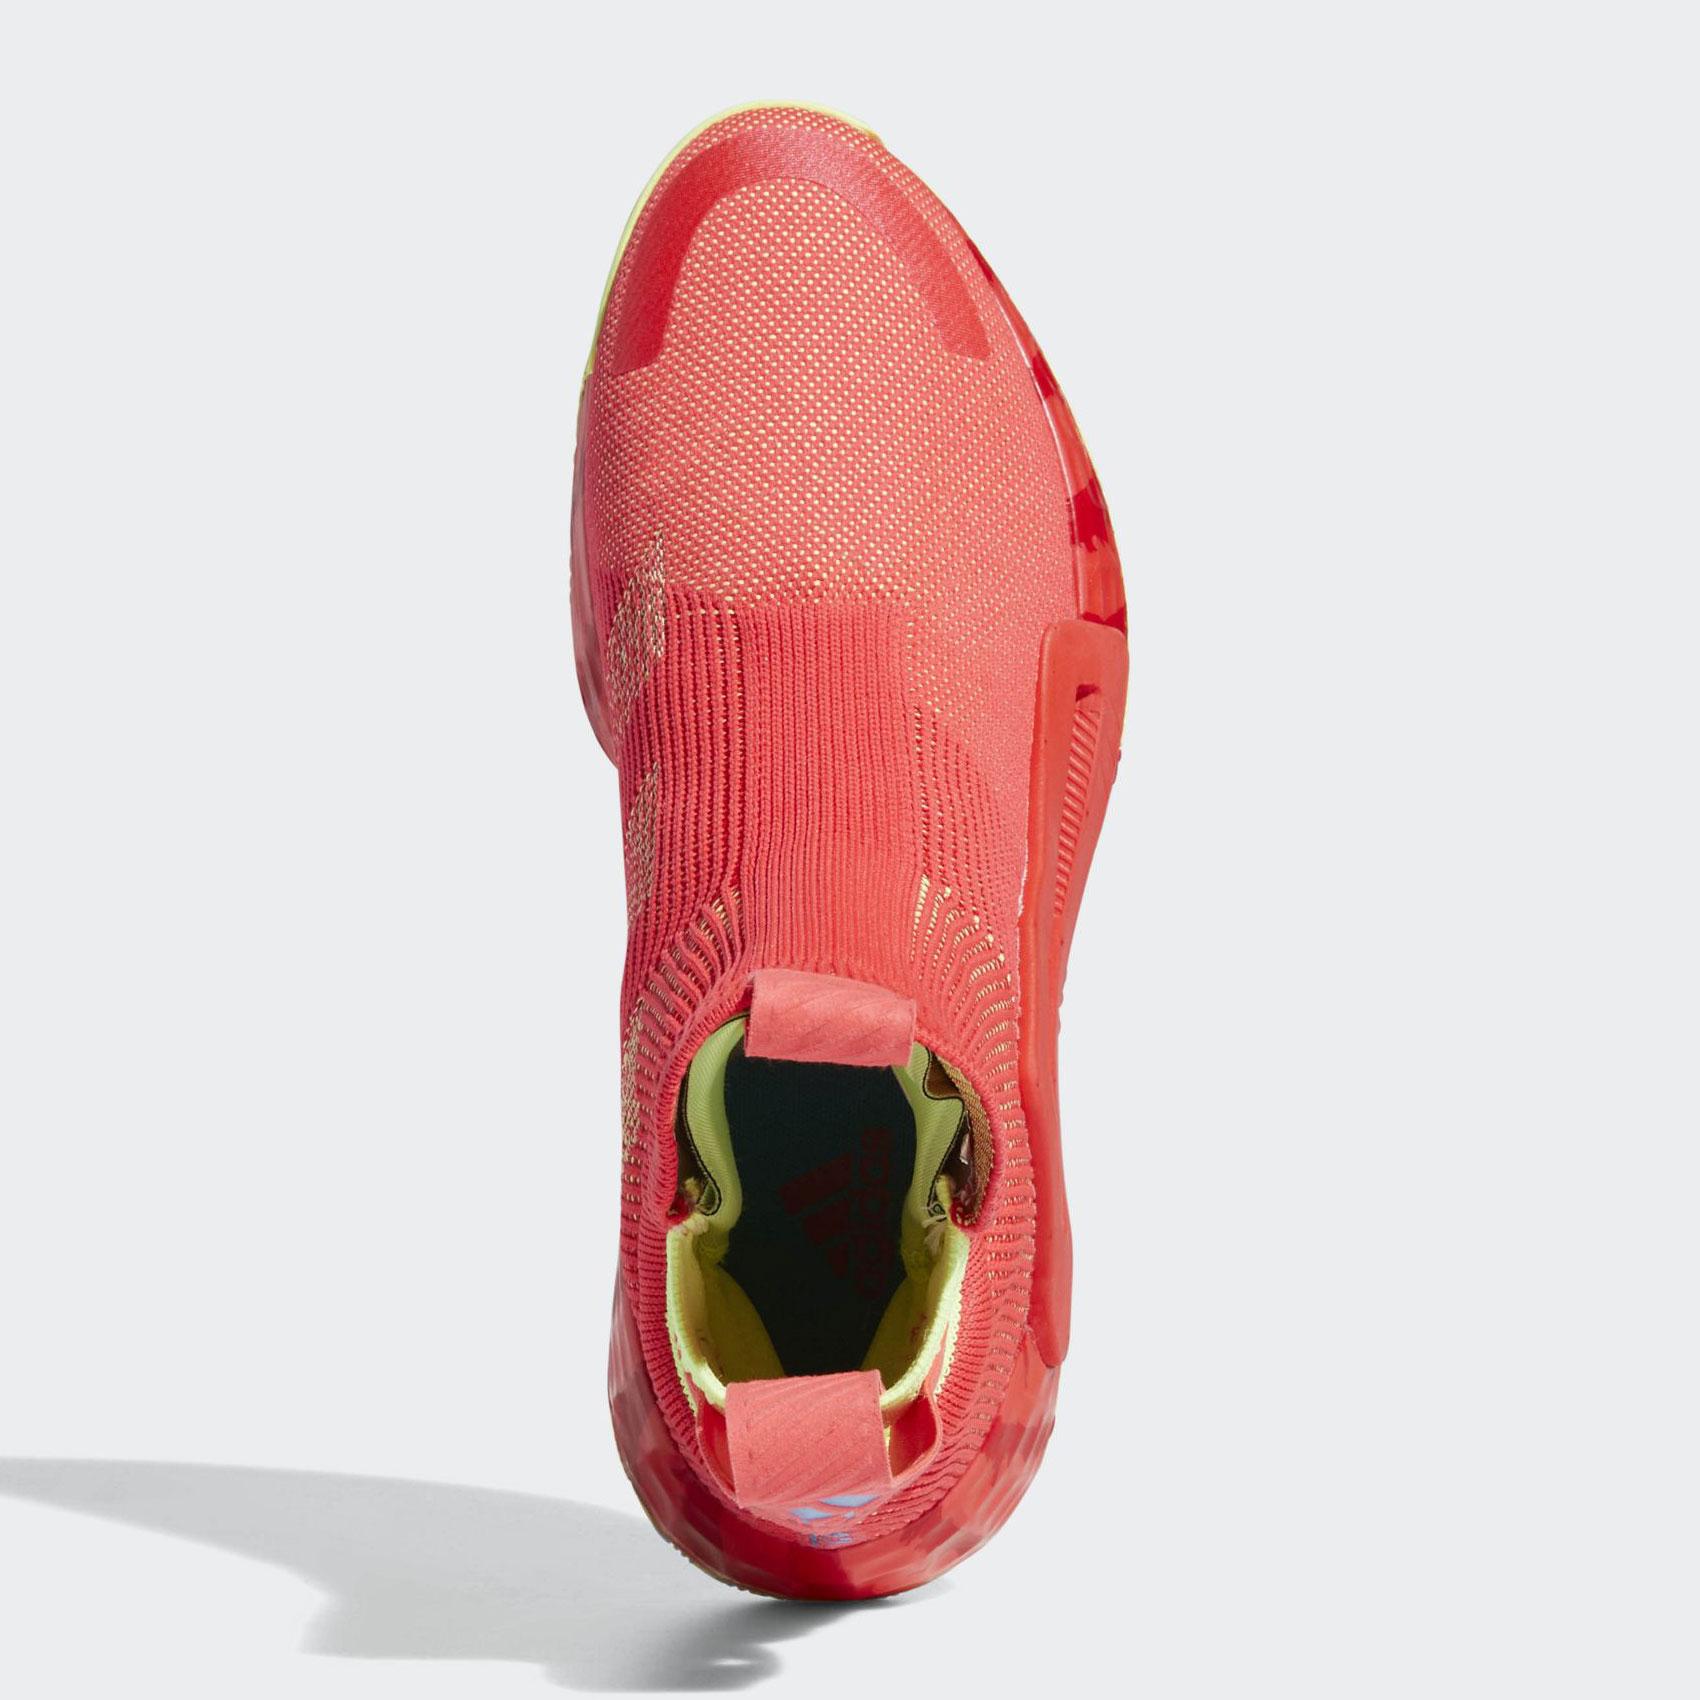 adidas Next Level G27761 Shock Red